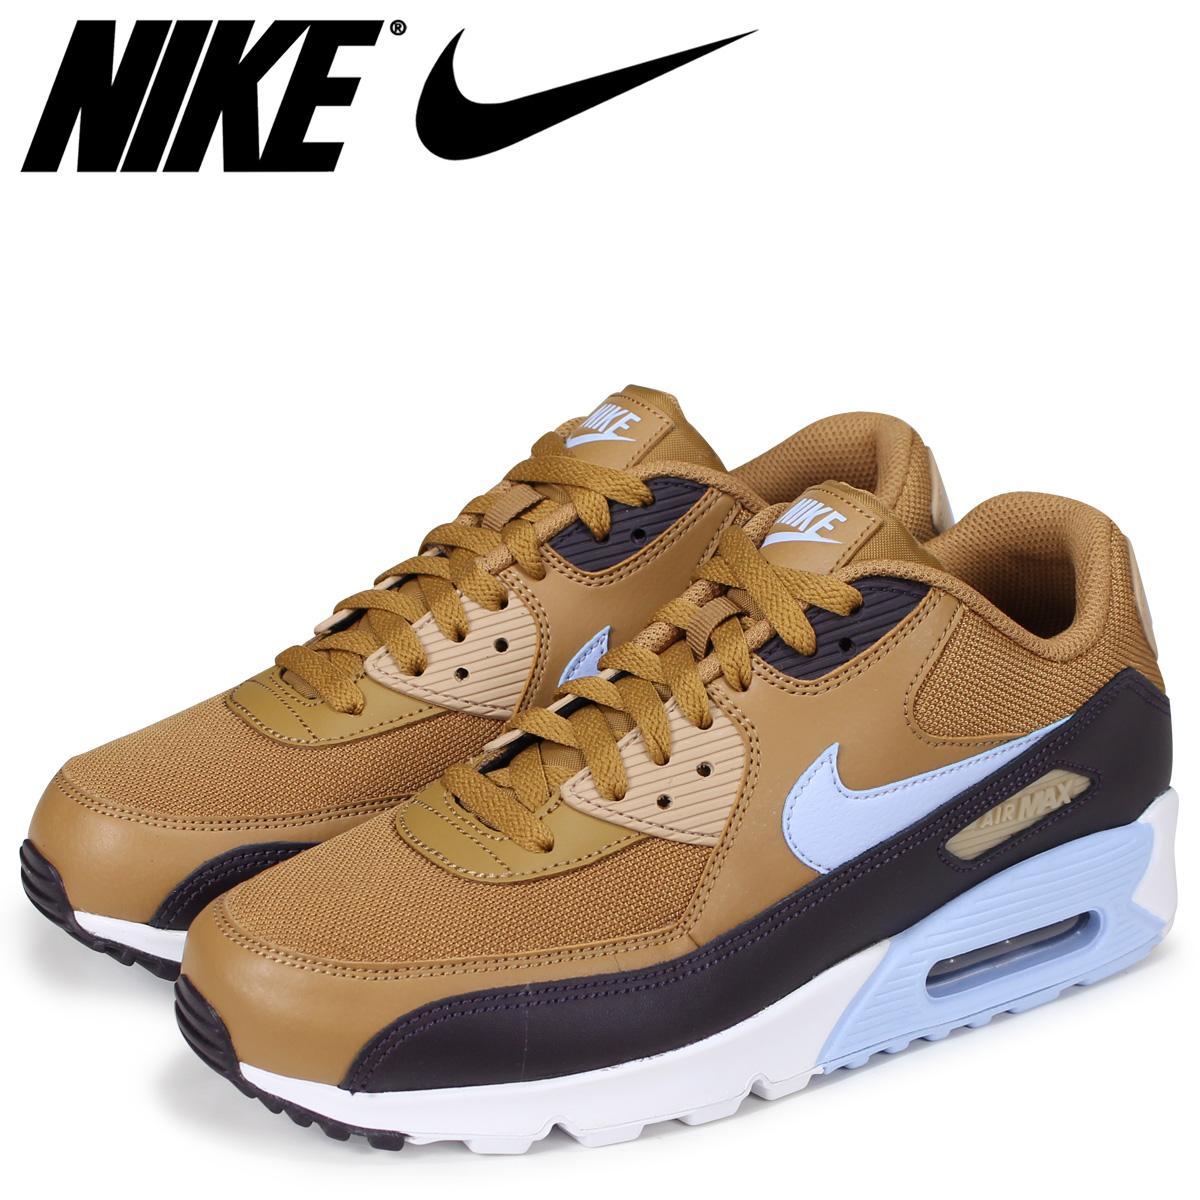 Sugar Online Shop  NIKE Kie Ney AMAX 90 essential sneakers men AIR ... 98e7573f1